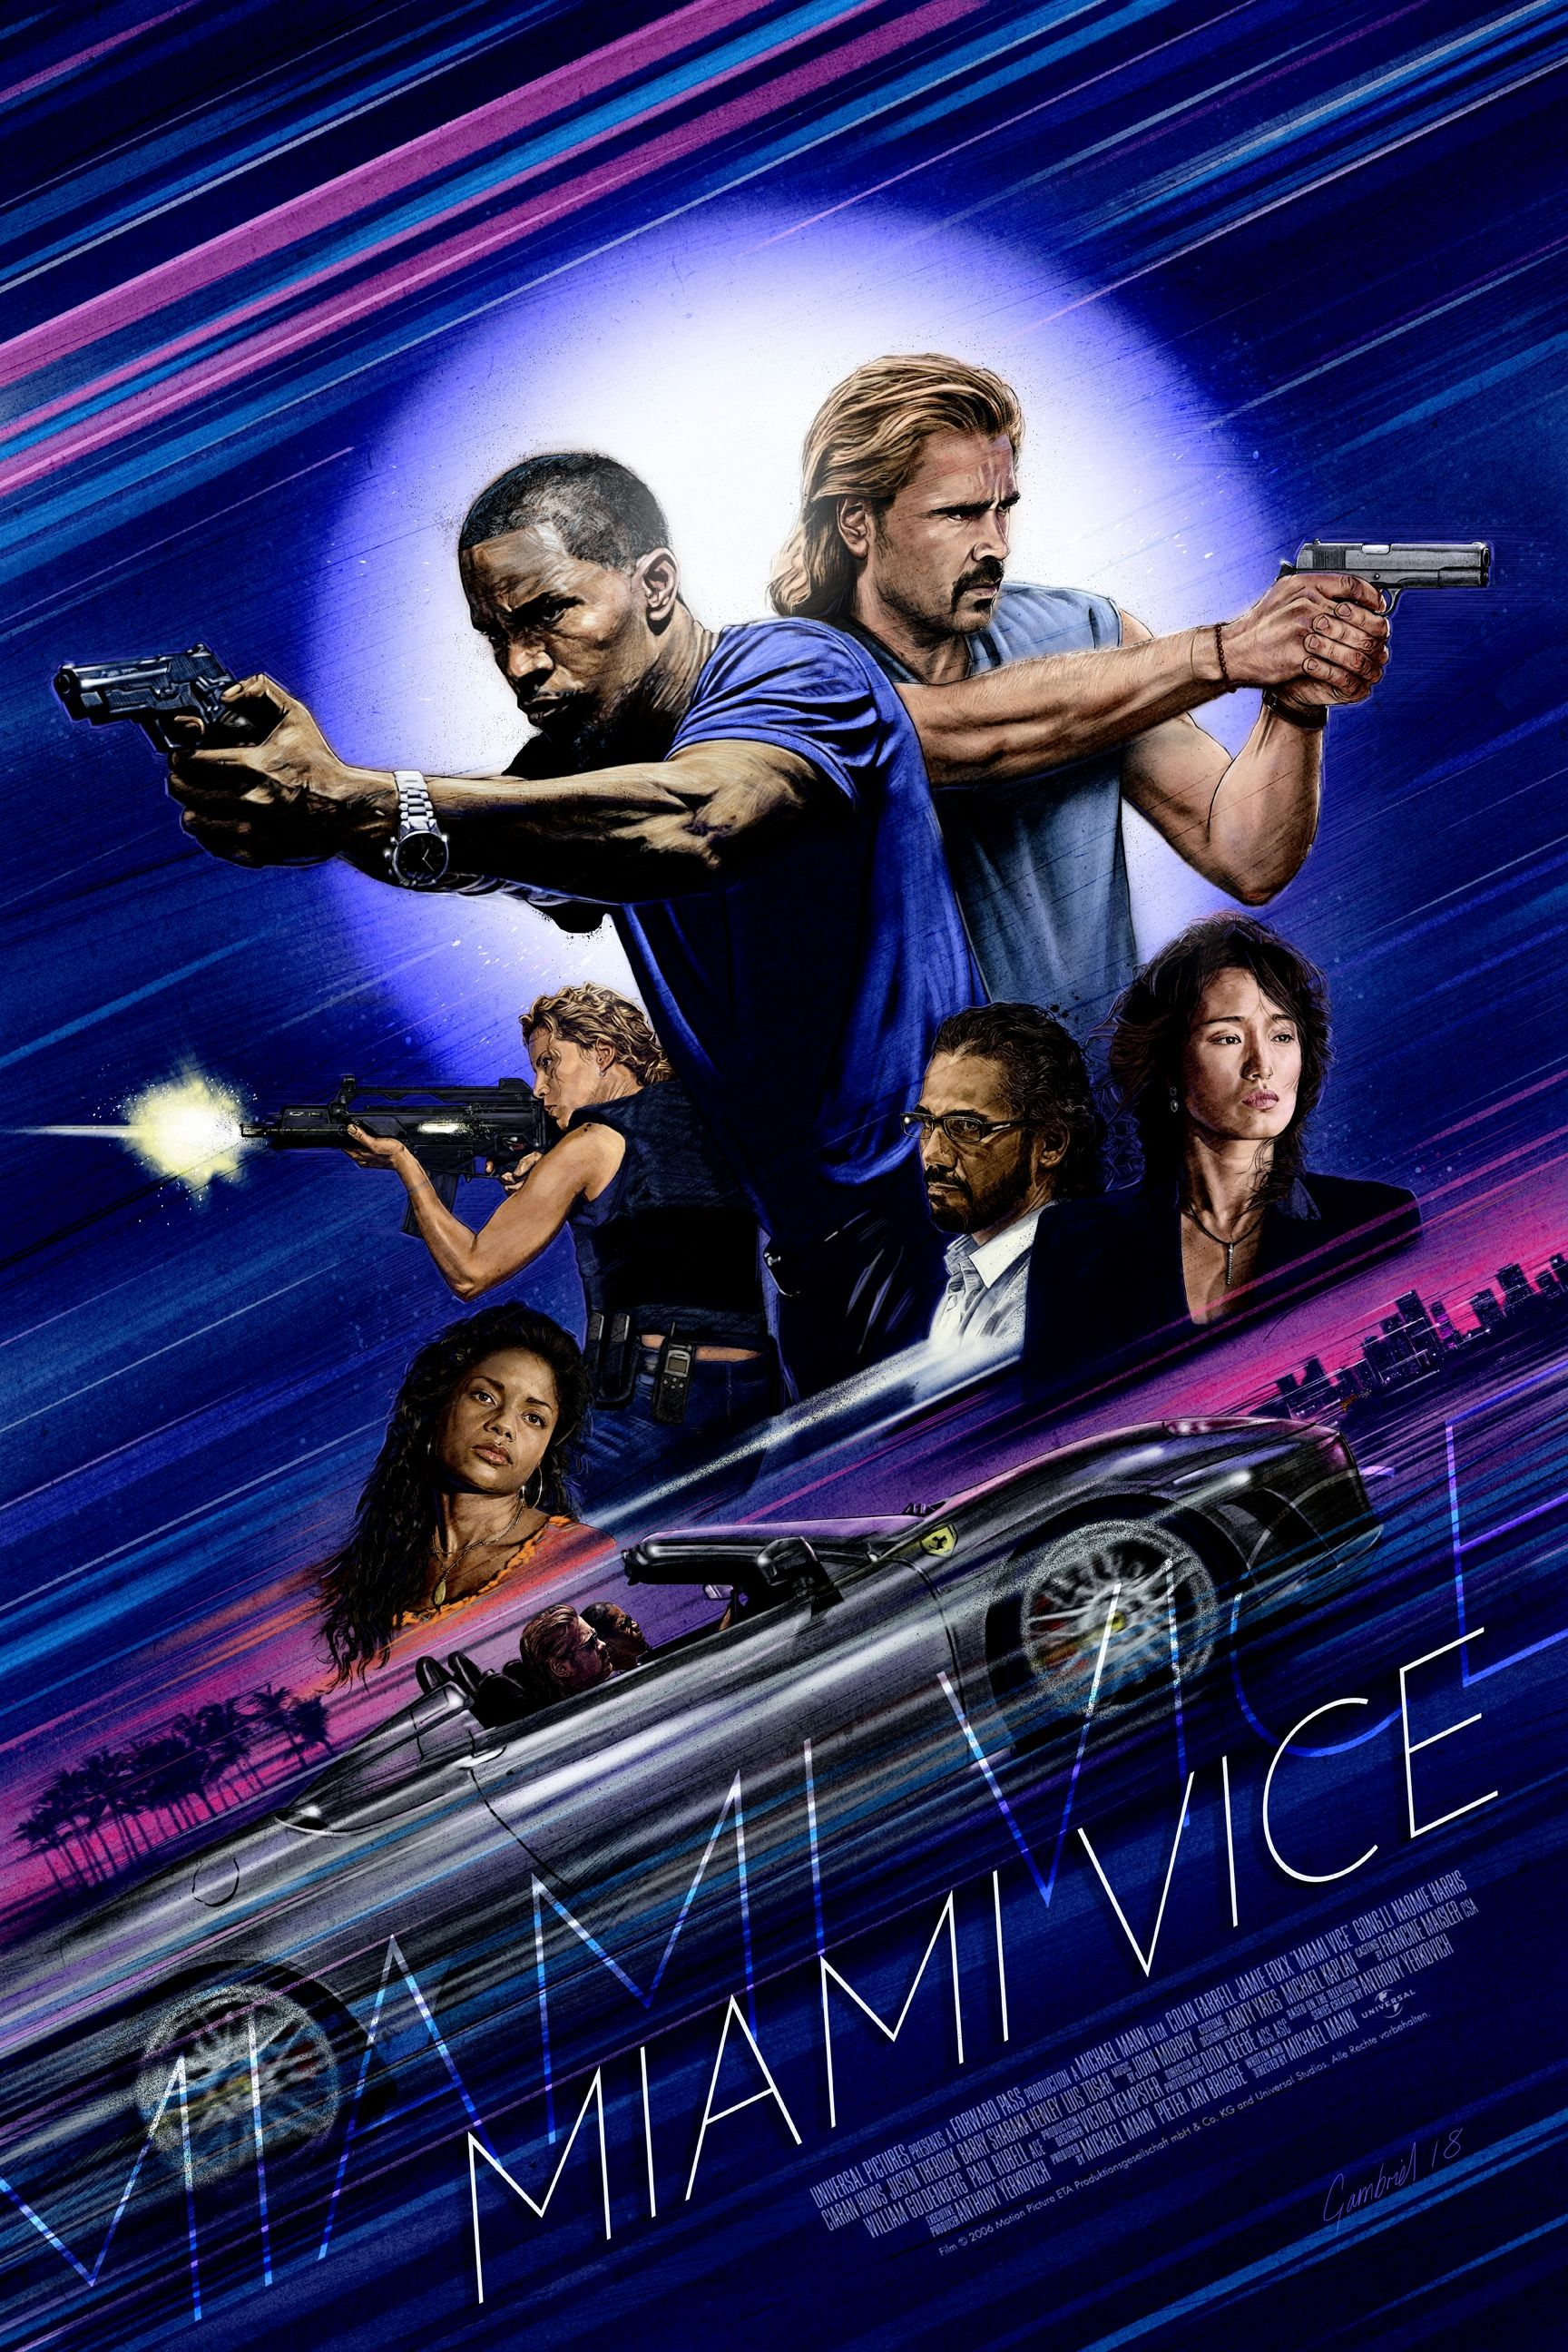 Miami Vice Posterspy Mike Gambriel Best Movie Posters Miami Vice Movie Posters